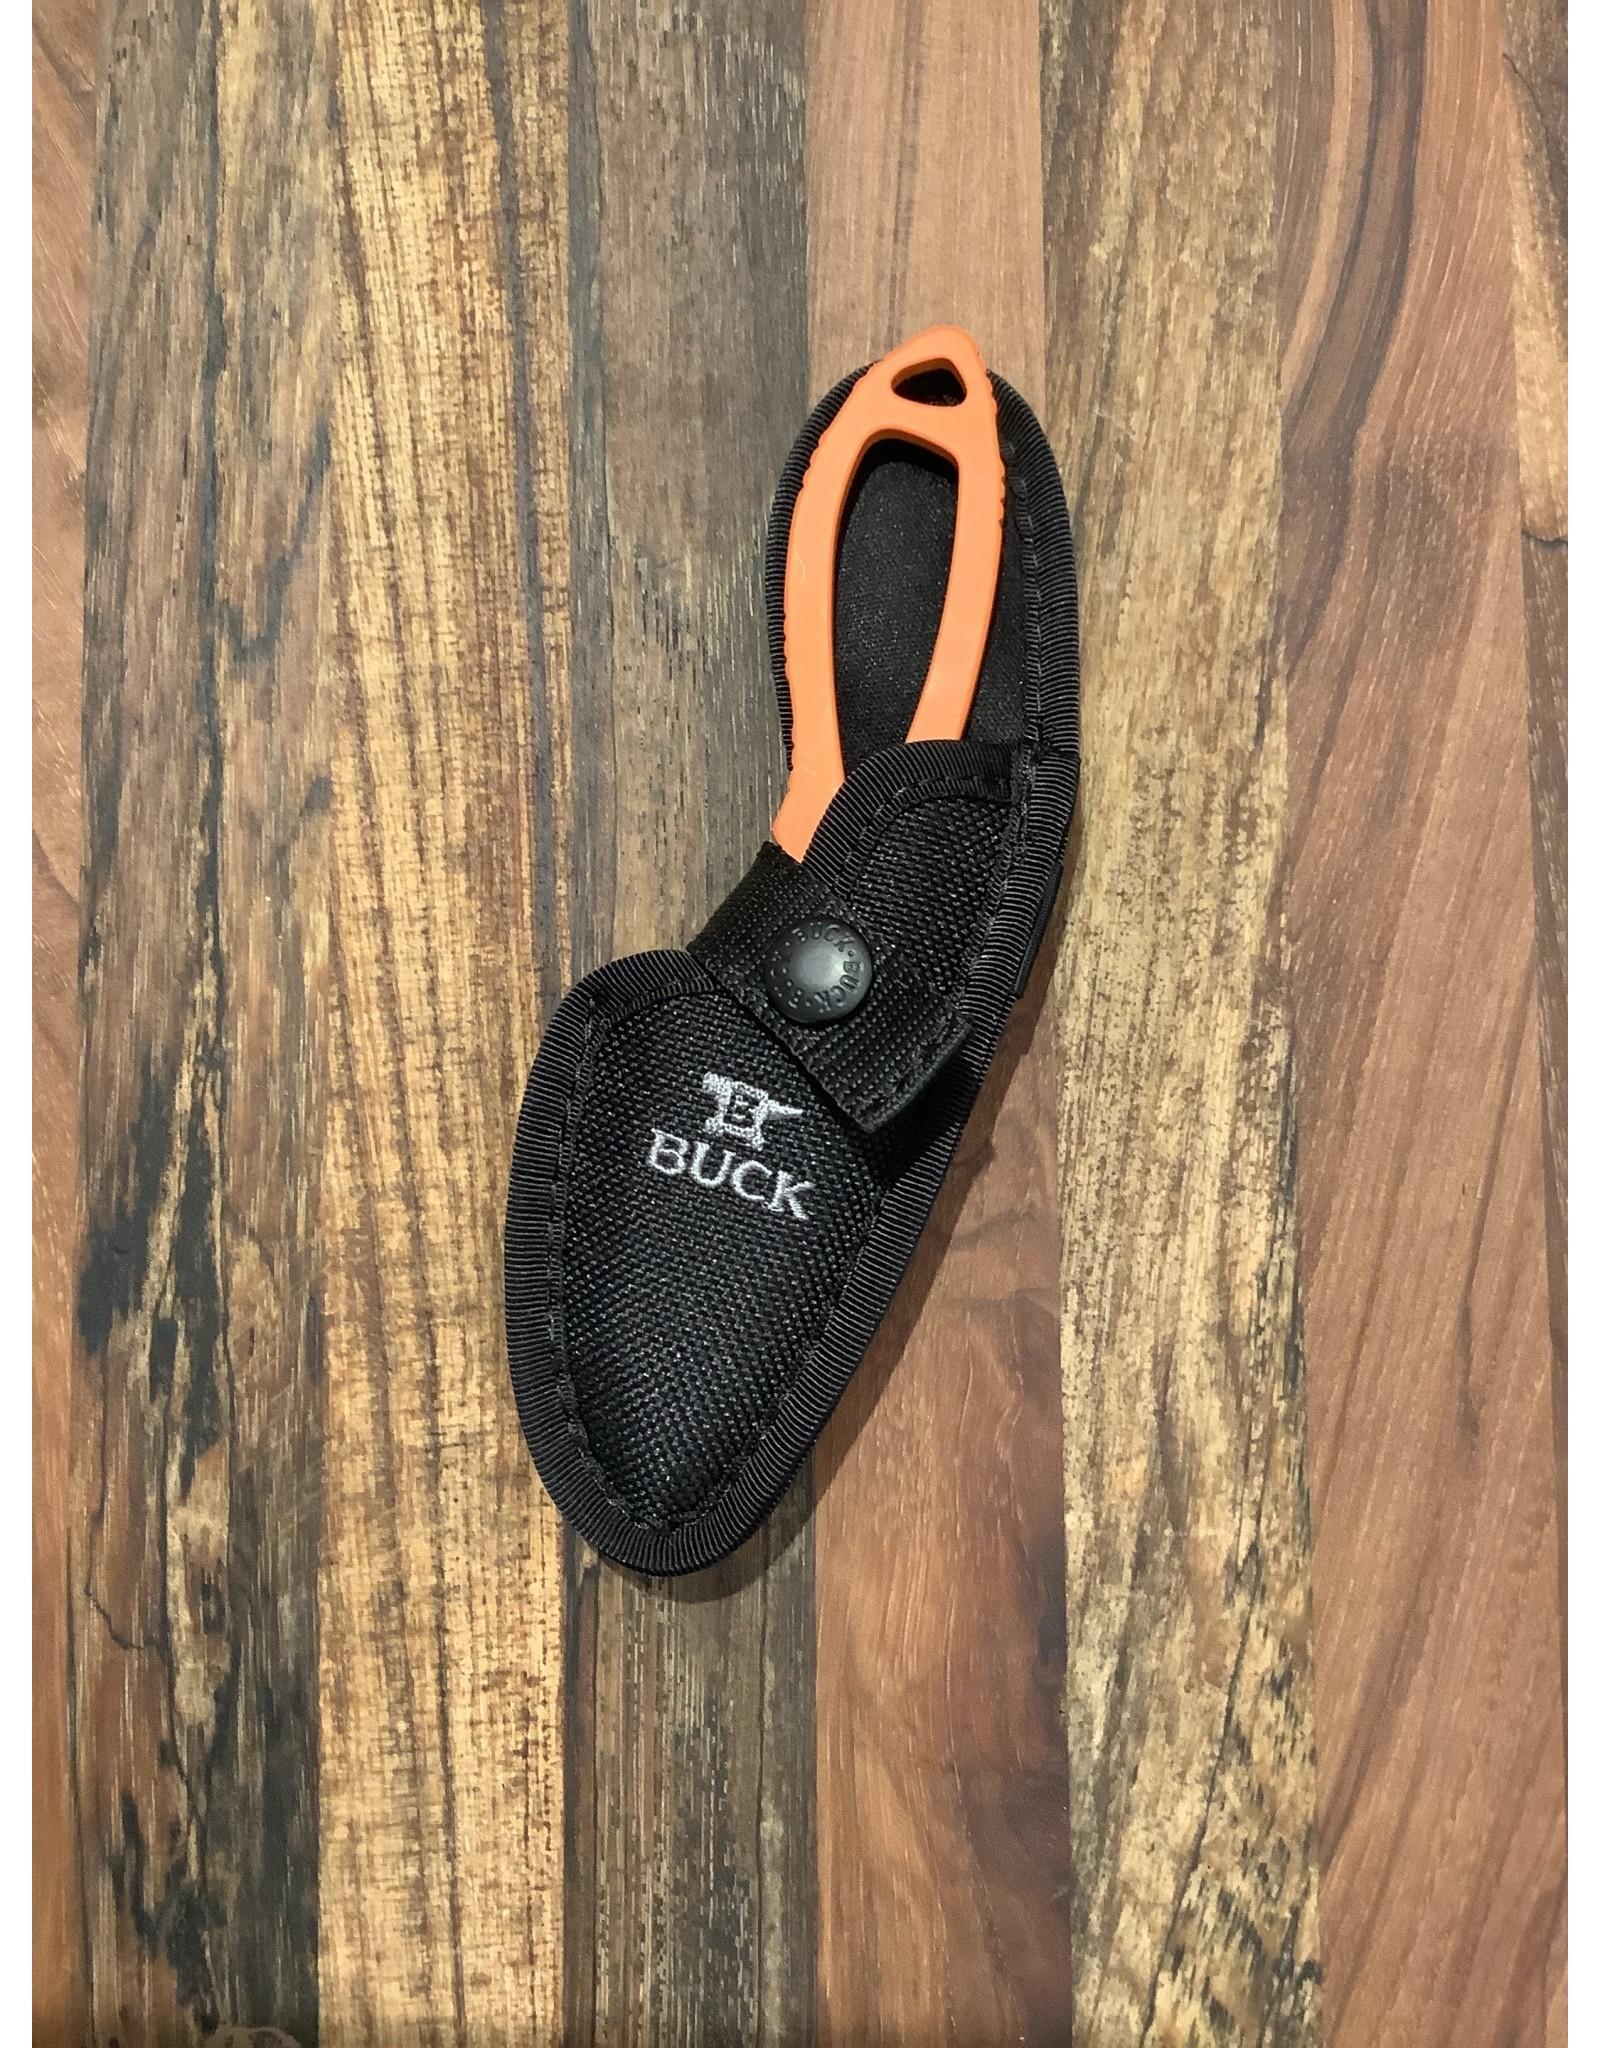 Buck BUCK Paklite Skinner Hunter Orange Cerakote